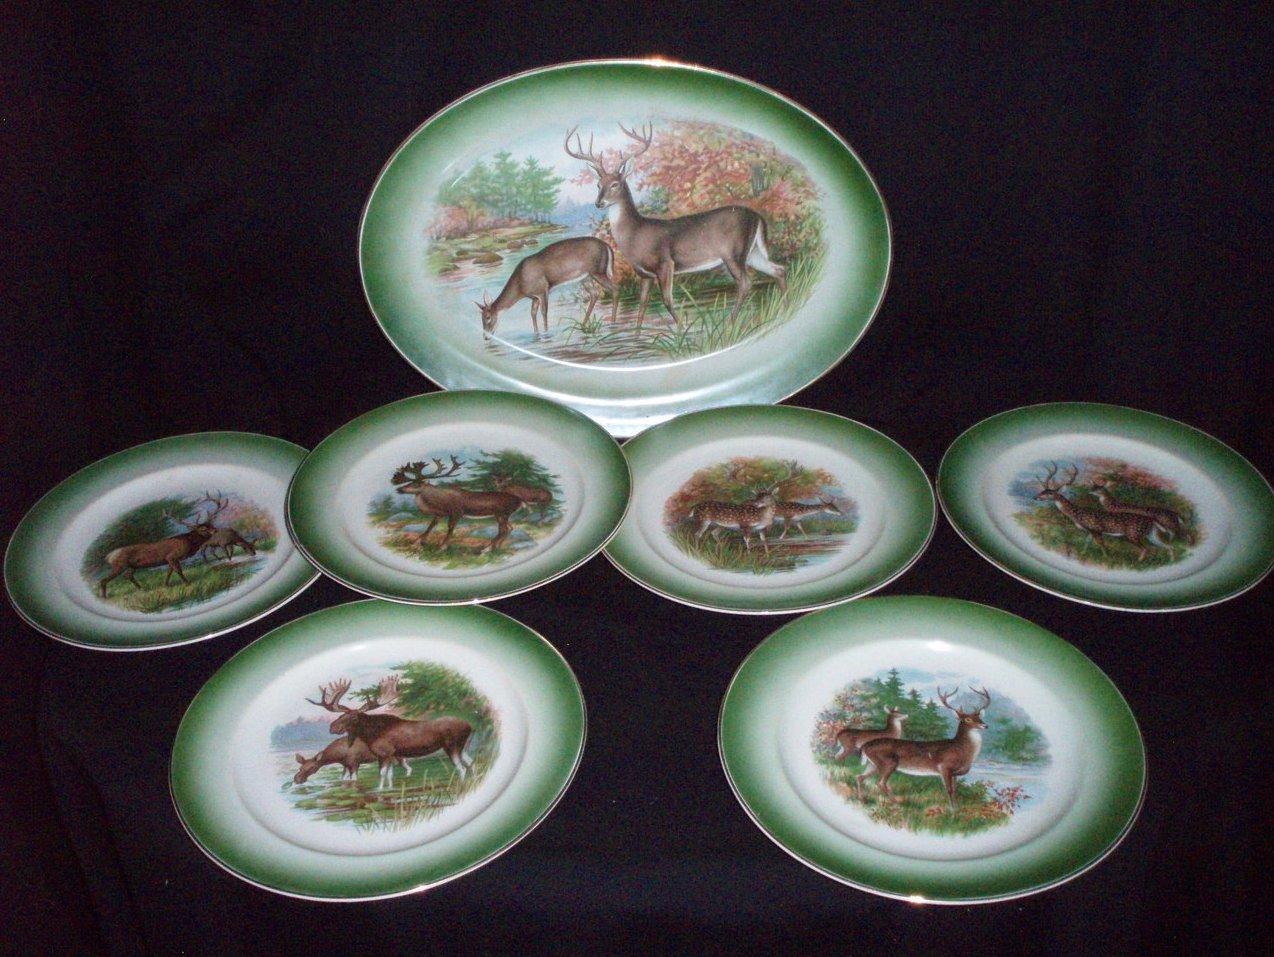 R K Beck Buffalo Pottery wildlife platter & plates vintage